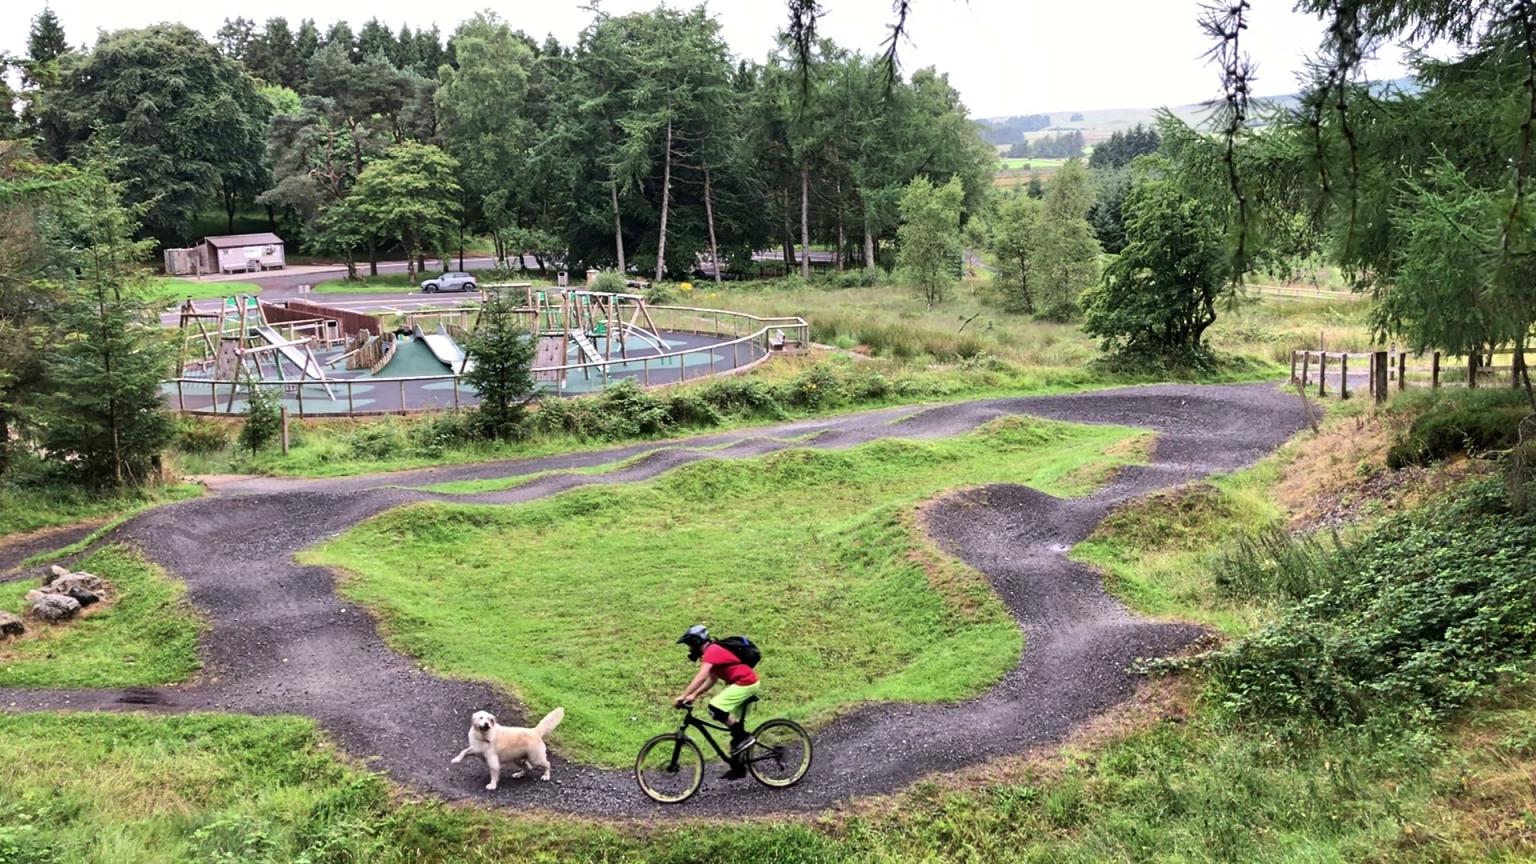 ni_explorer_davagh_forest_mountain_biking_northern_ireland (2).jpg